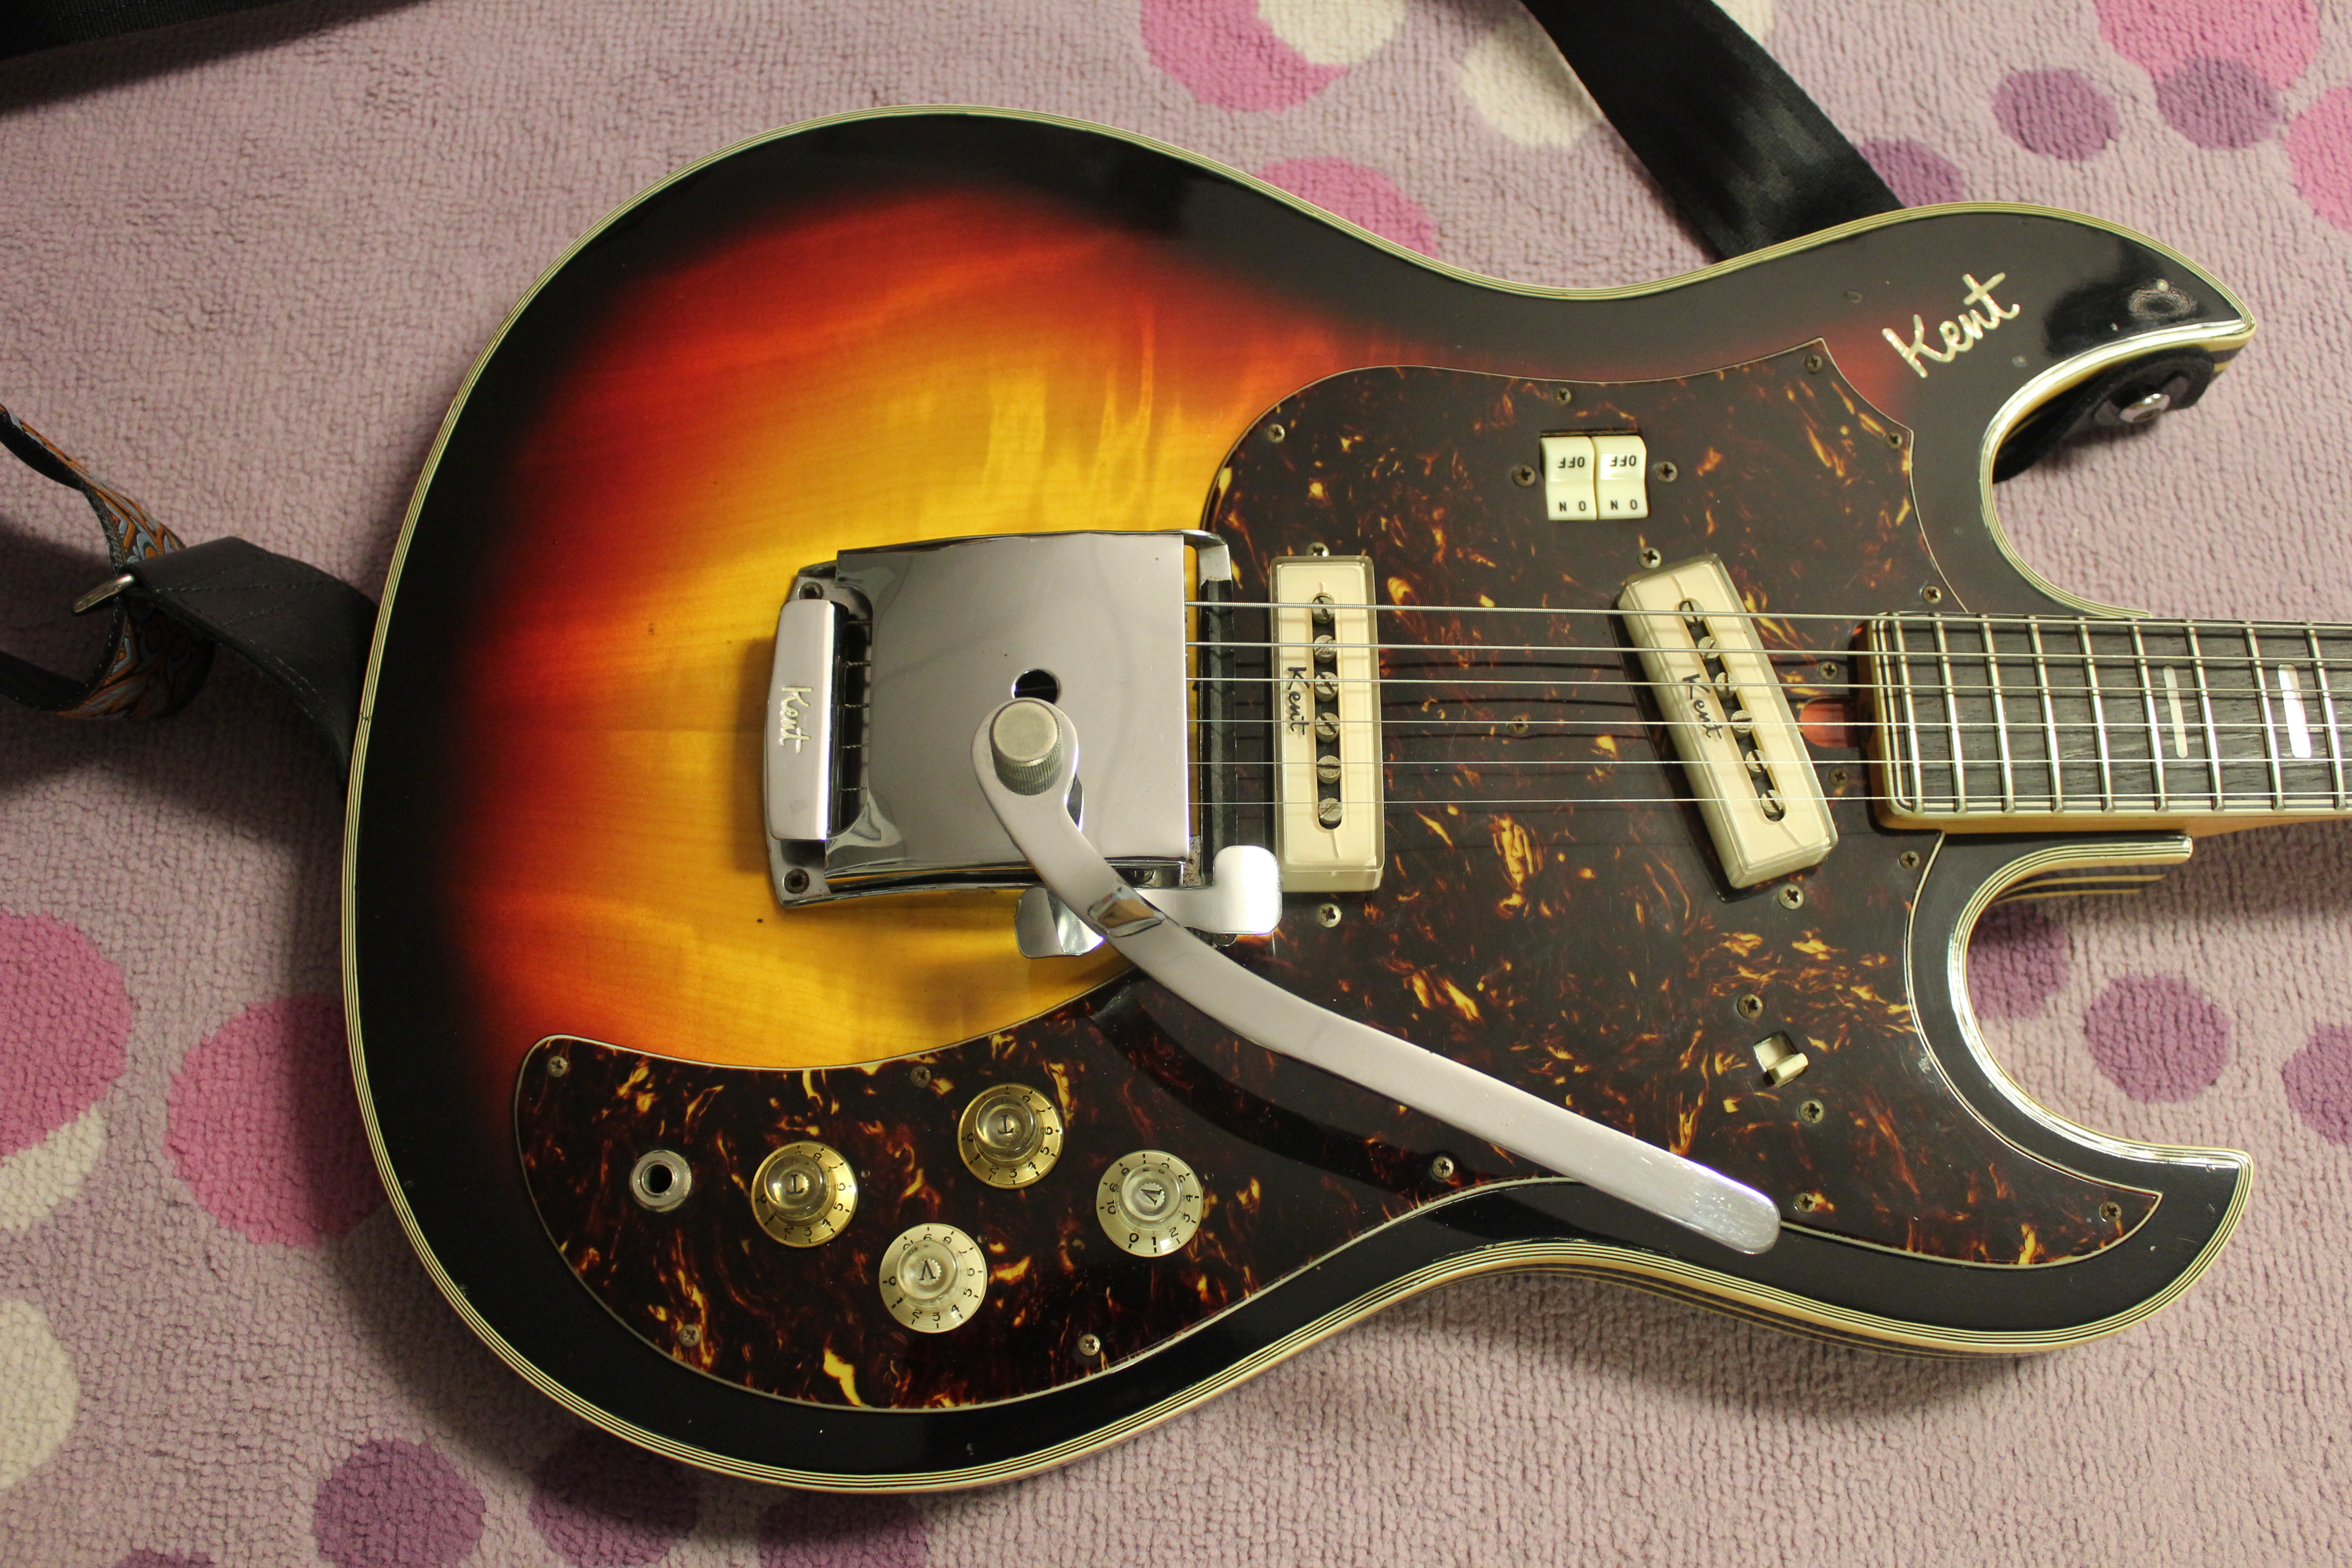 1967 69 kent 740 solidbody electric guitar japan made drowning rh drowninginguitars com HSS Guitar Wiring Diagram 120V Electrical Switch Wiring Diagrams